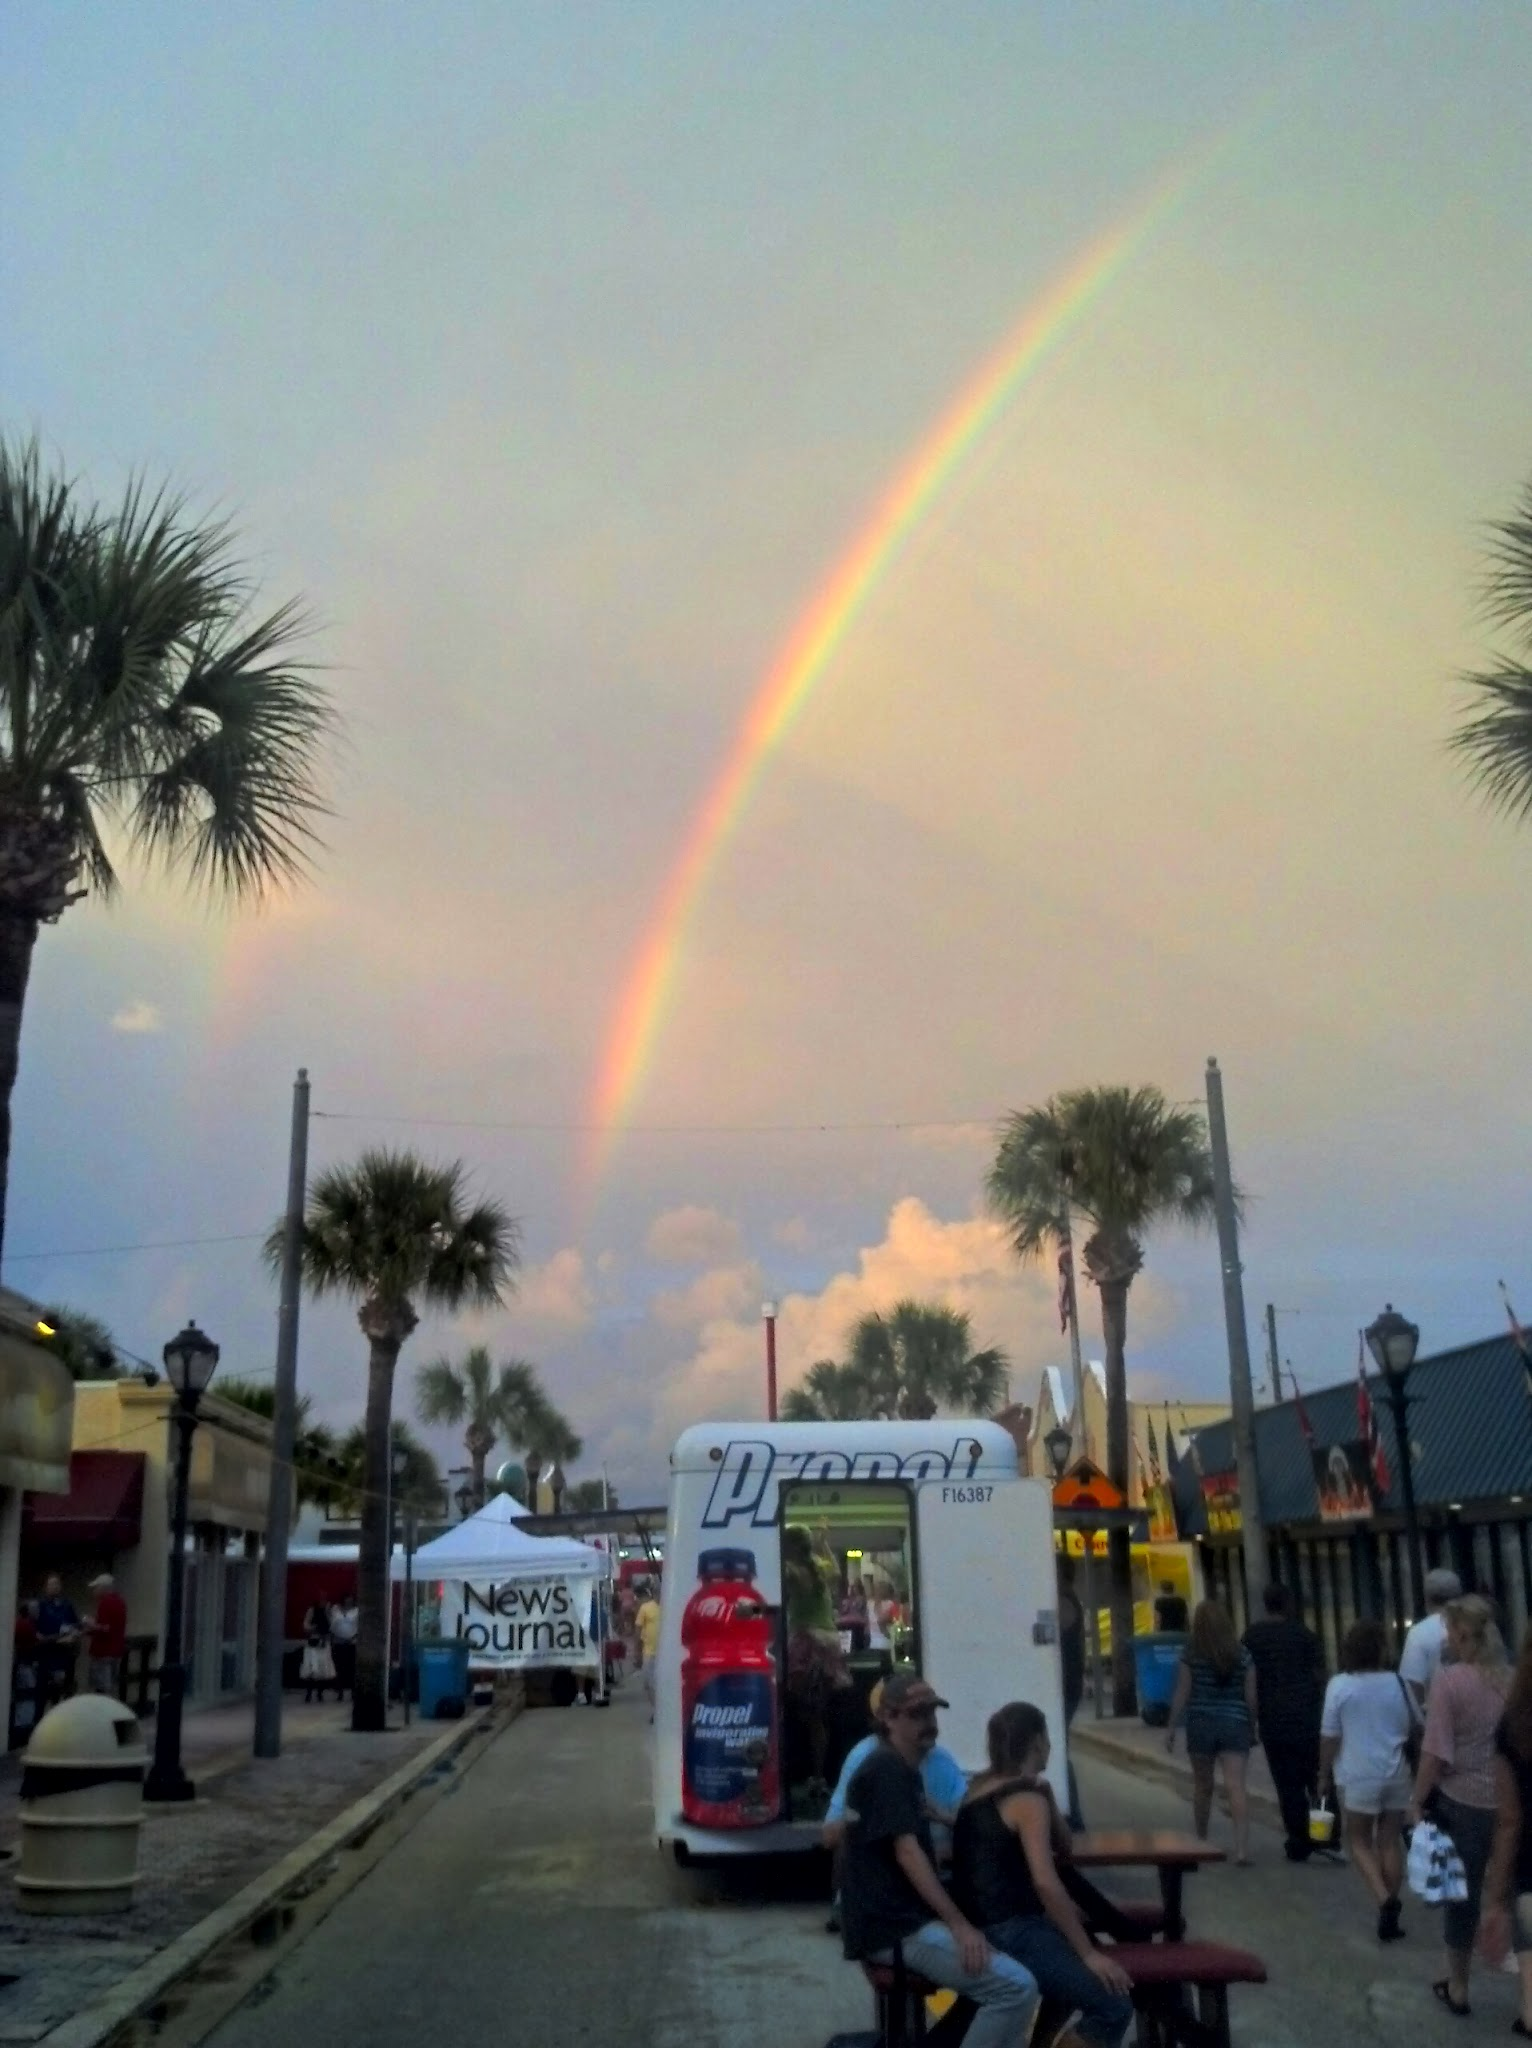 Daytona Eye Center Ormond Beach